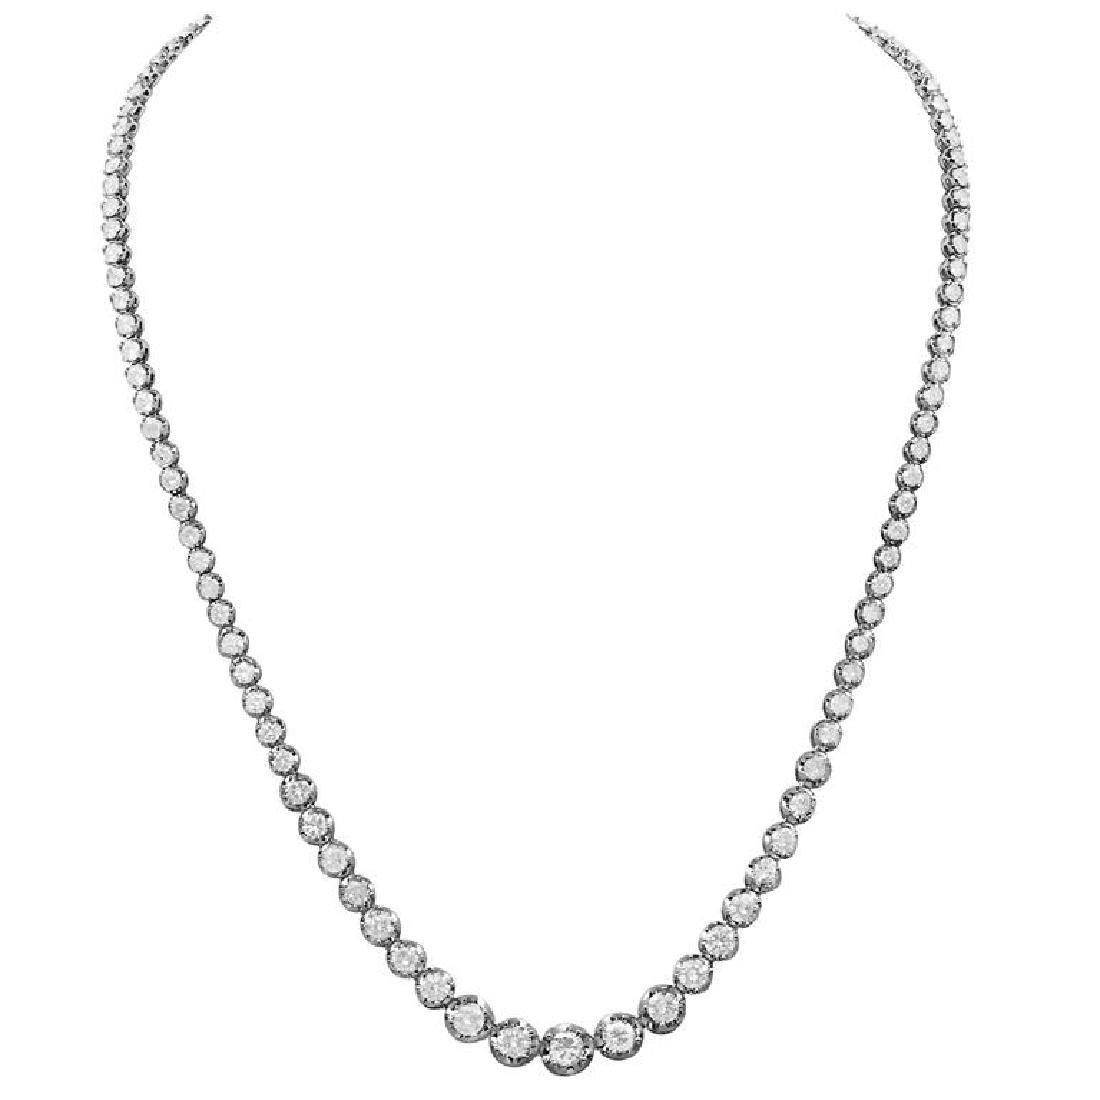 14k White Gold 11.24ct Diamond Necklace